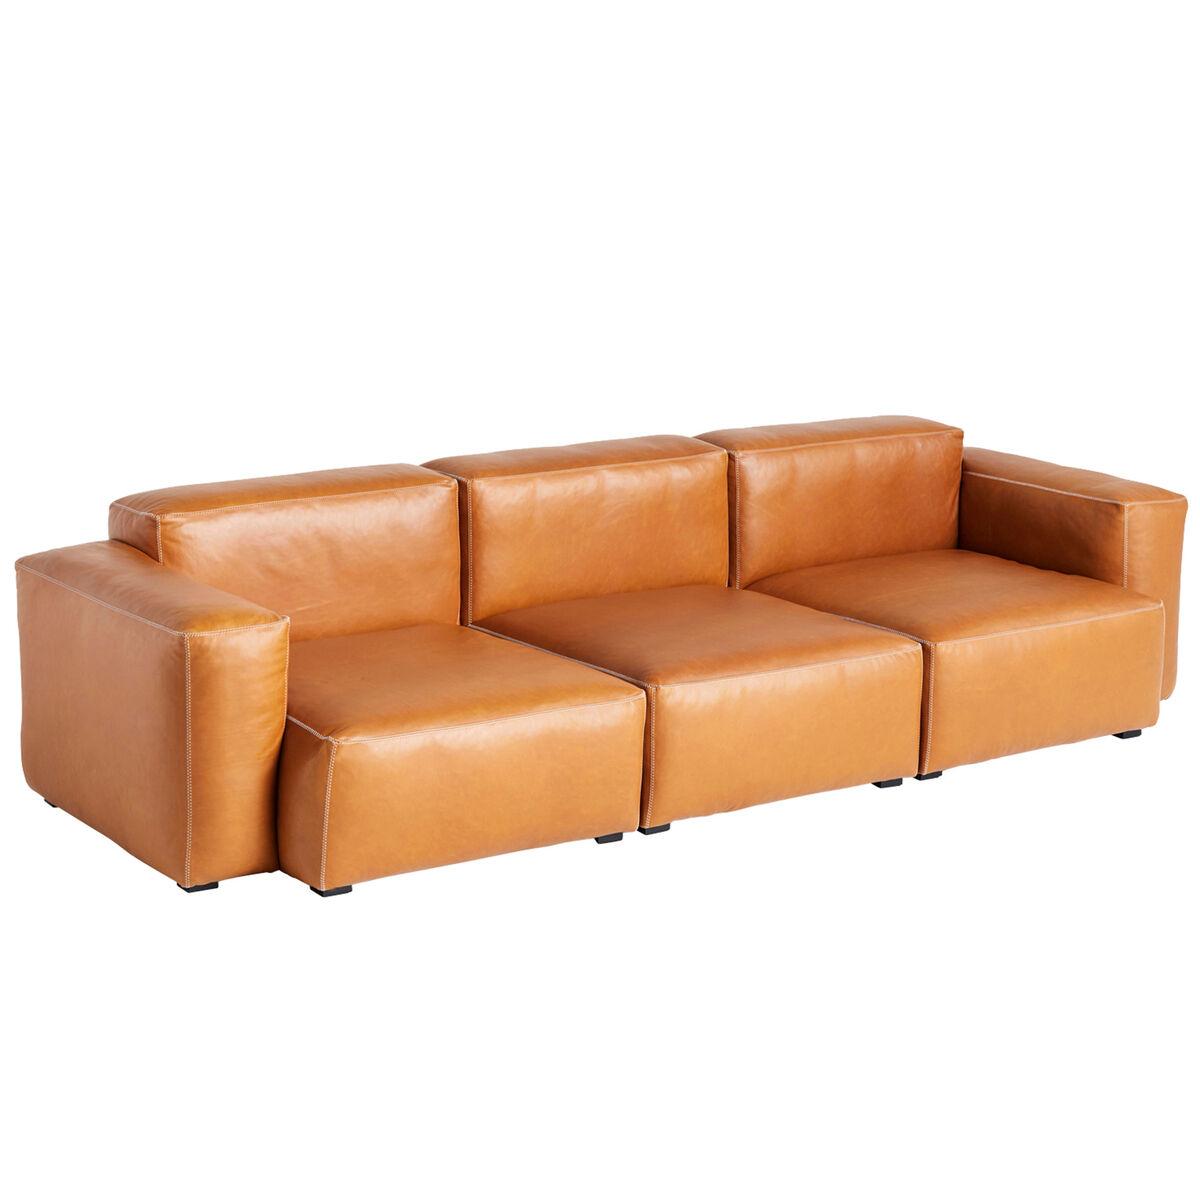 Hay Mags Soft sohva 3-ist/269 cm, matala k�sinoja, Silk 0250